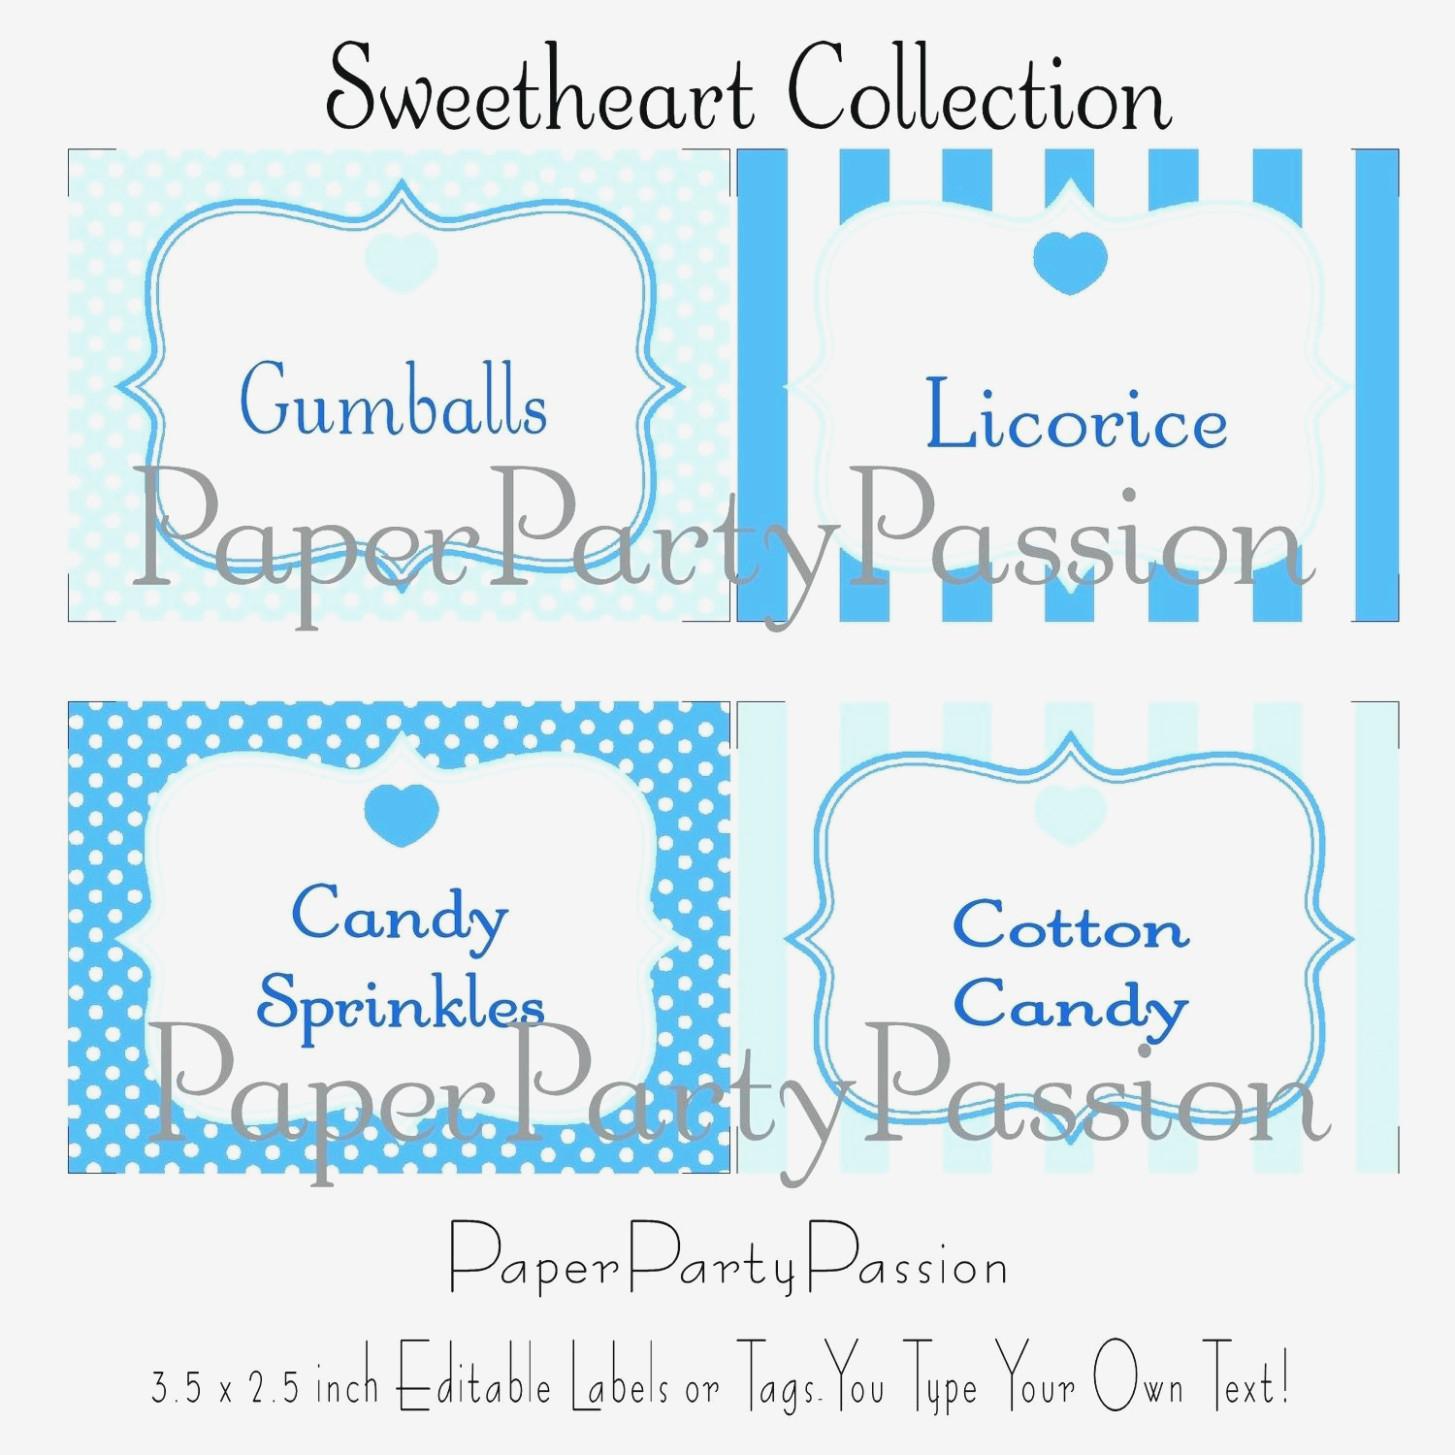 Candy Buffet Label Template – Candy Buffet Labels Free Printable - Free Printable Candy Buffet Labels Templates